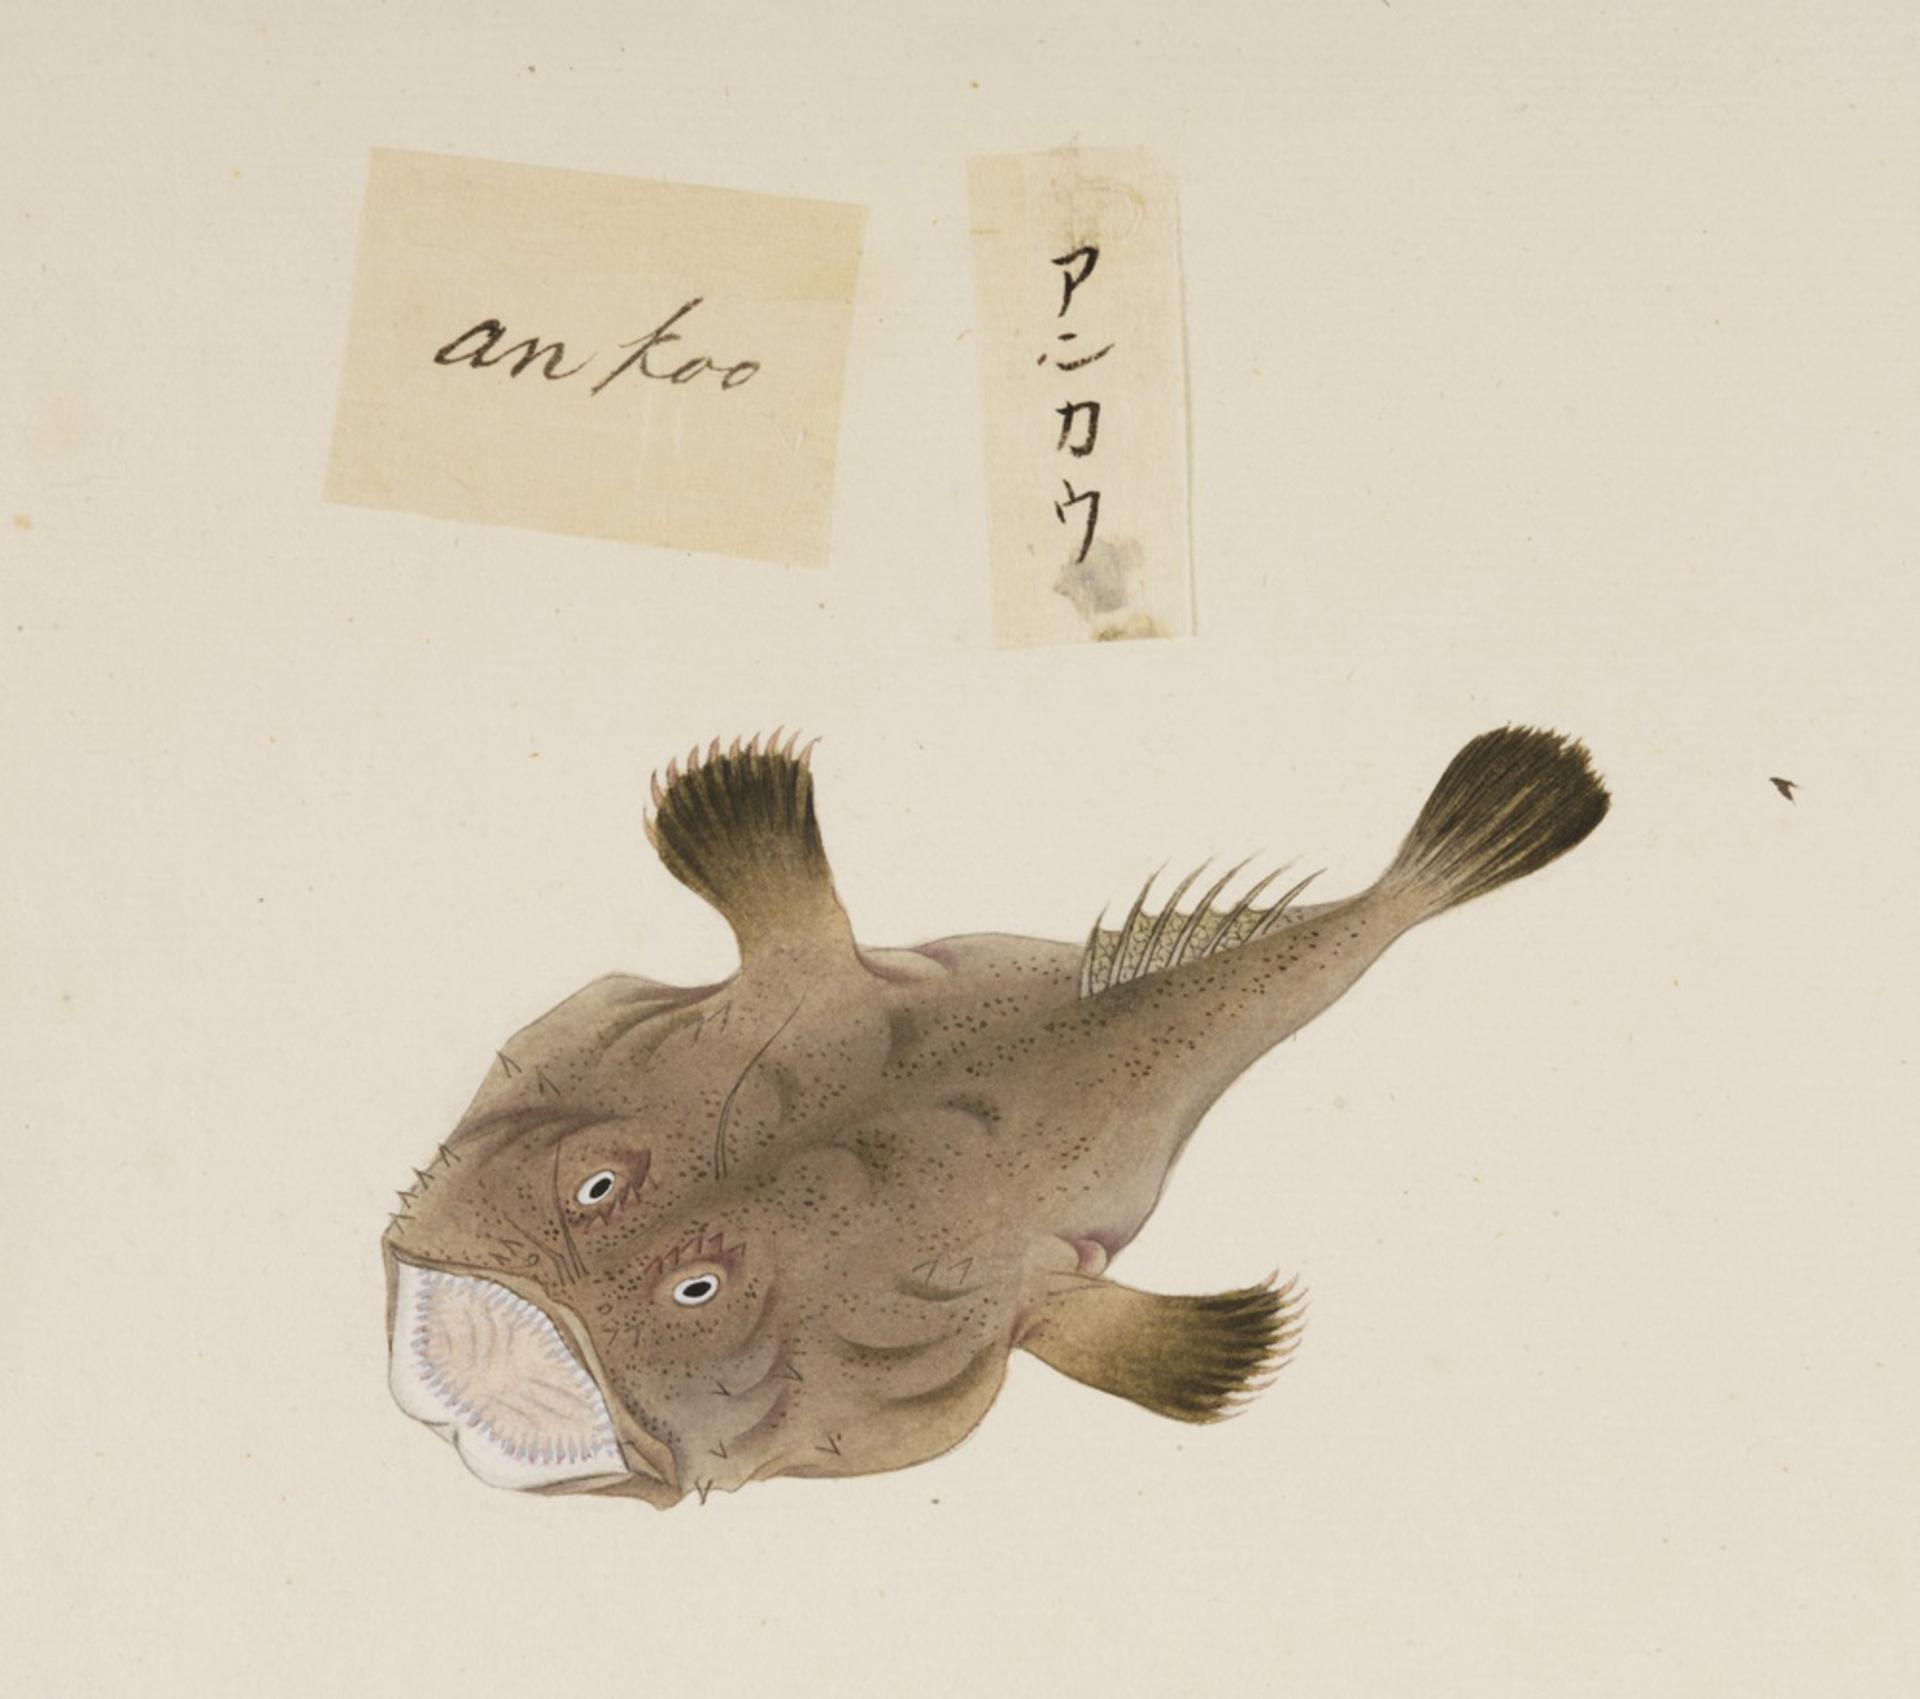 RMNH.ART.536 | Lophiomus setigerus